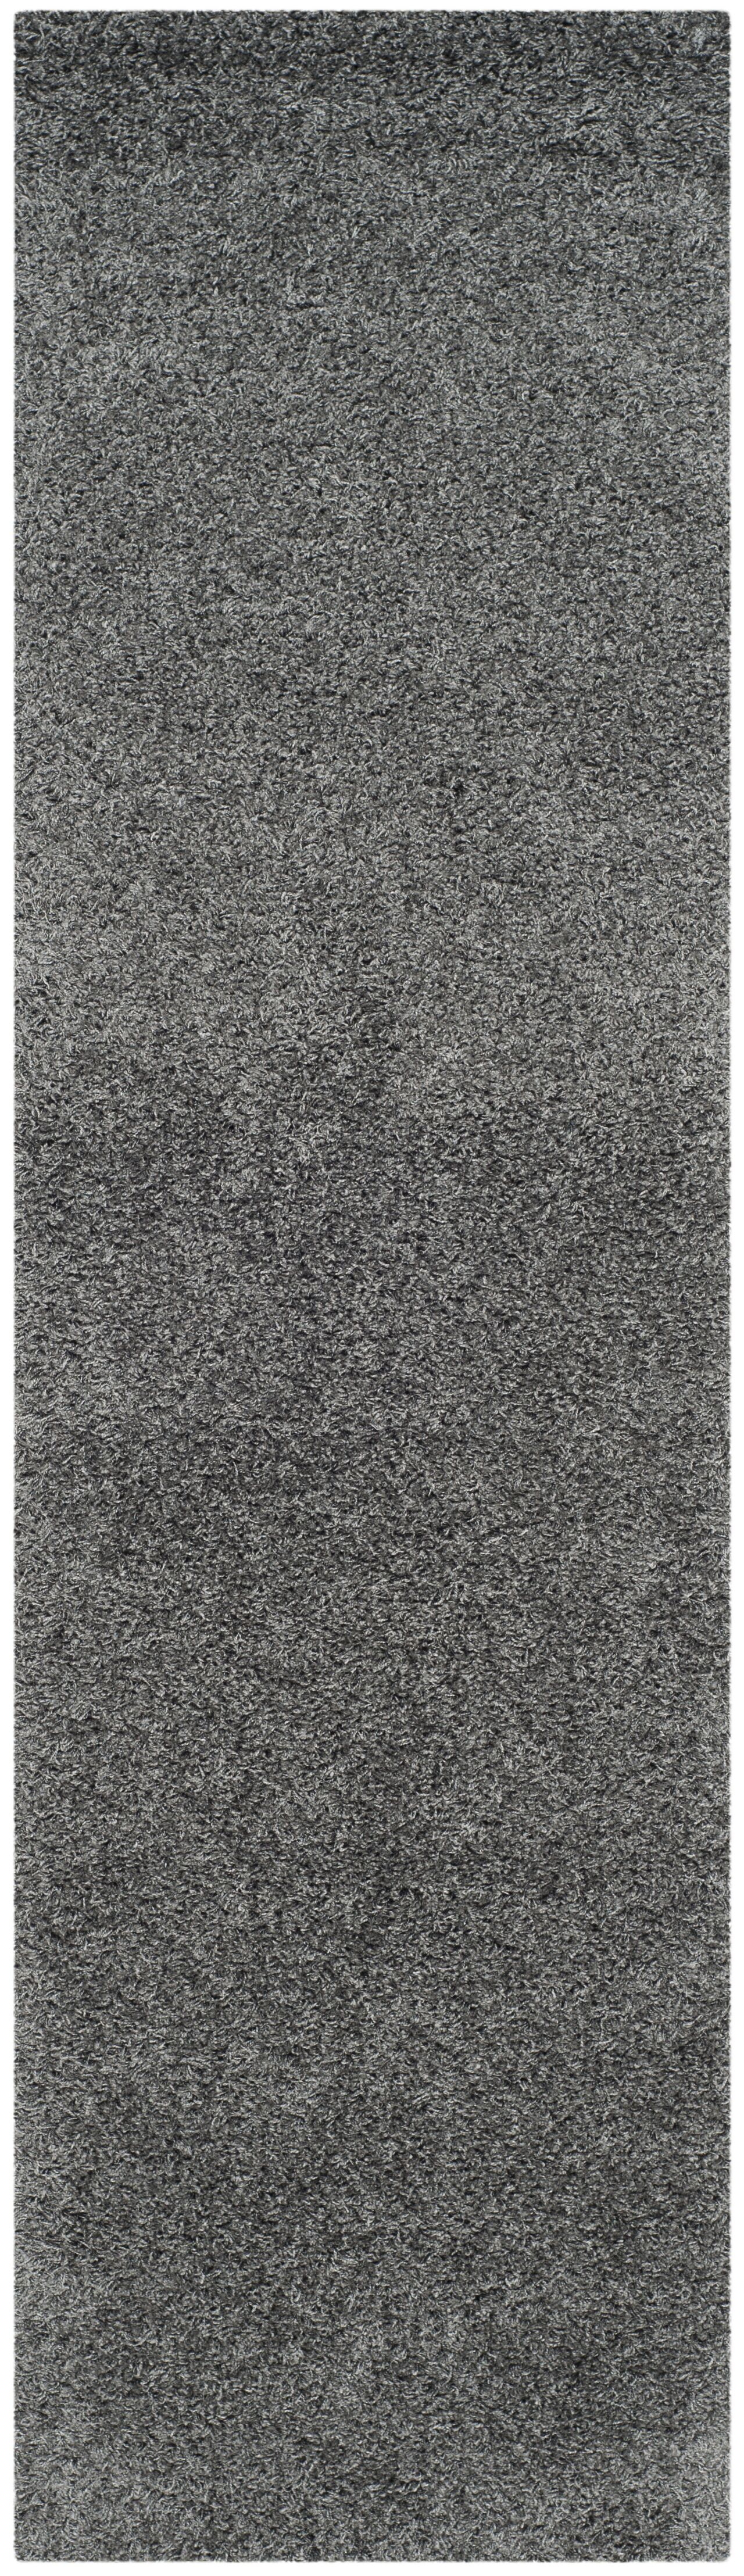 Nickols Shag Dark Gray Area Rug Rug Size: Rectangle 8'6